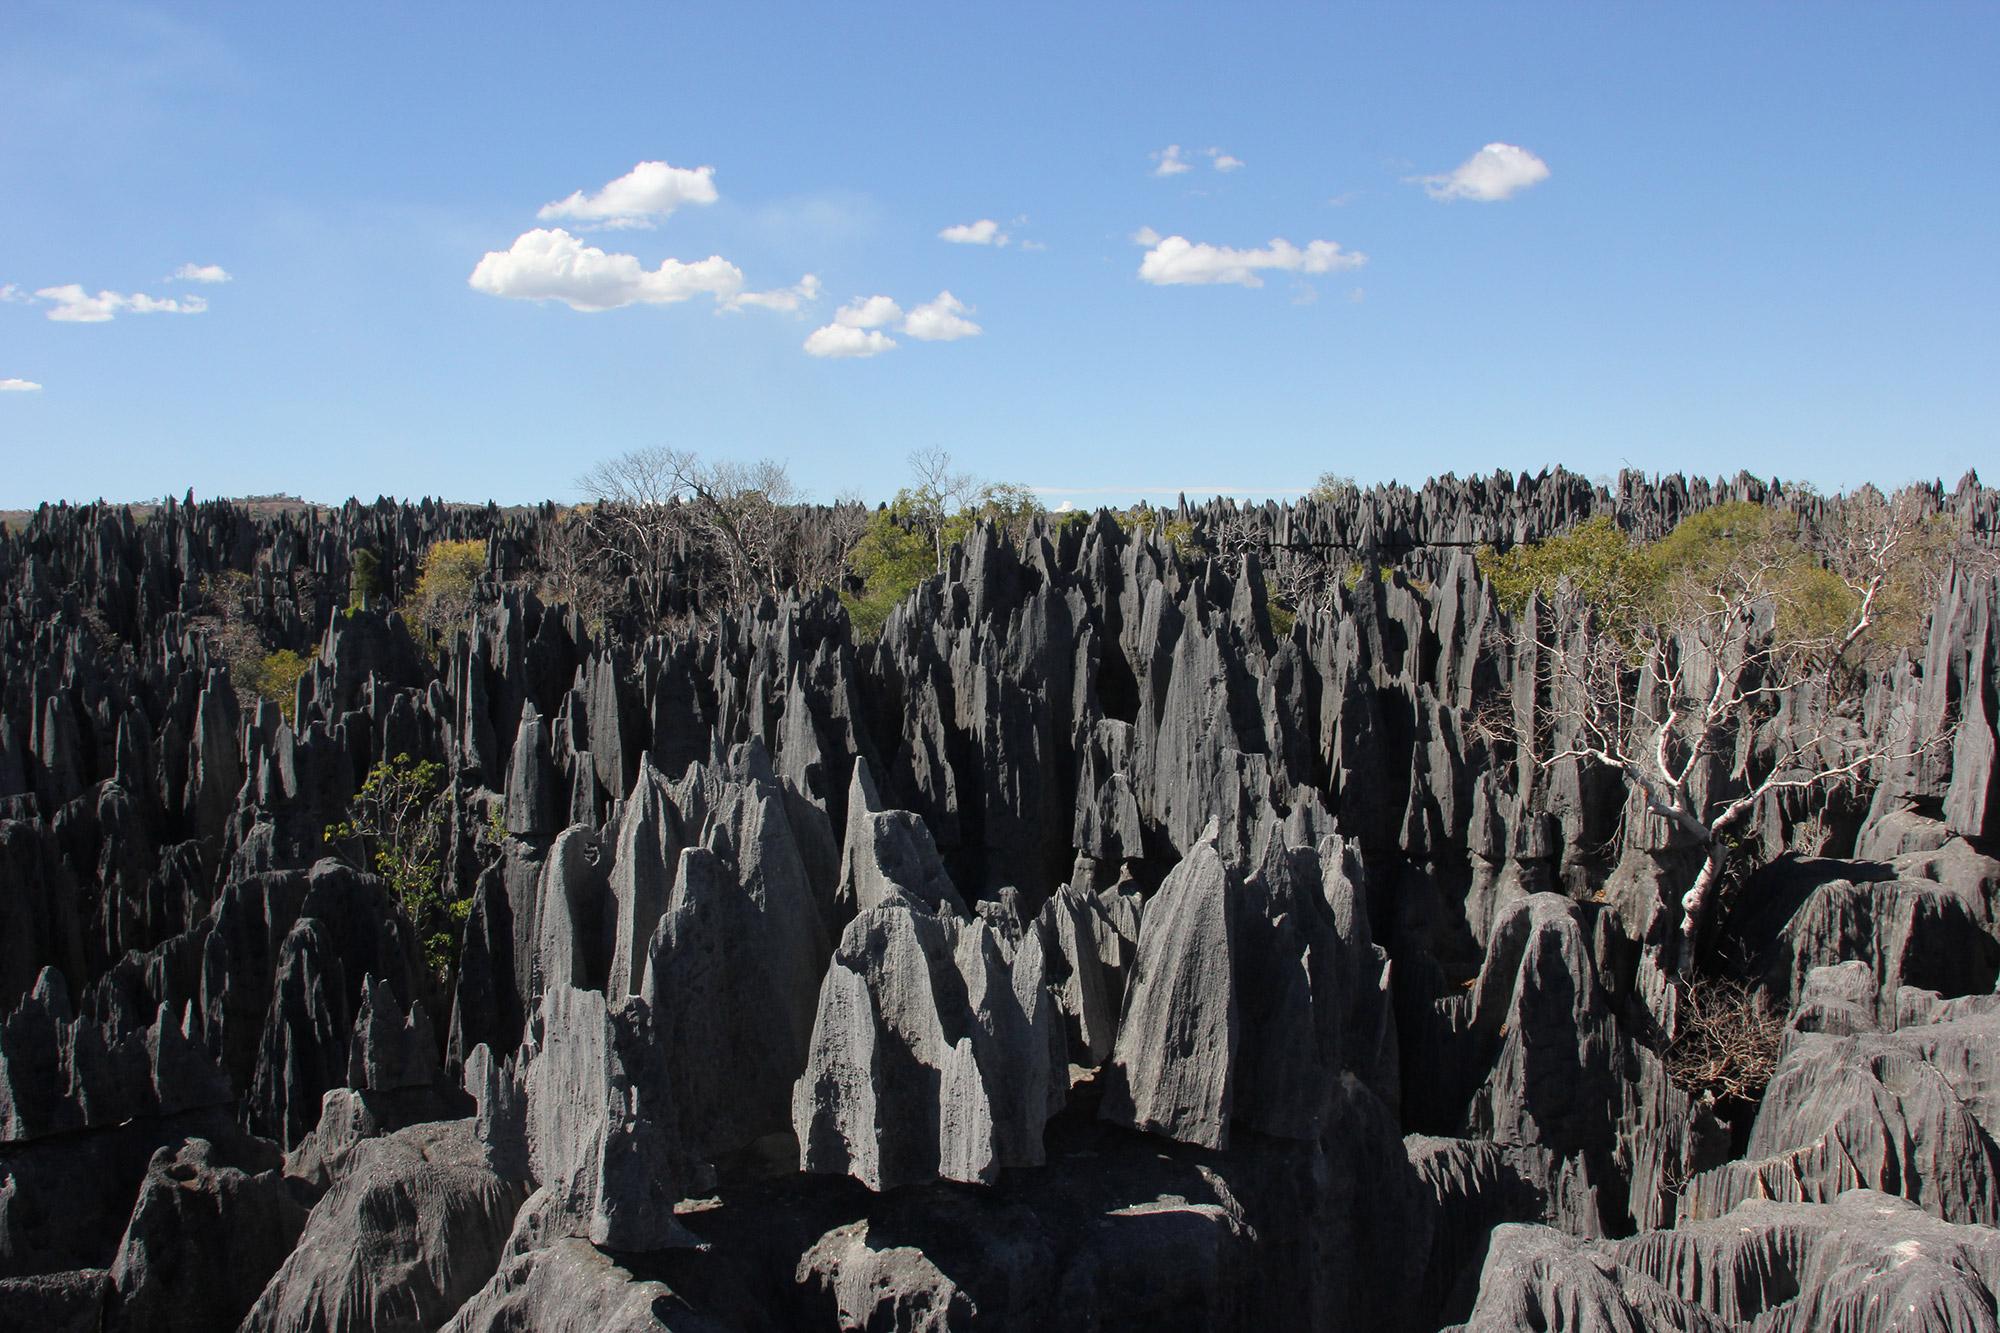 De volgers van Reizen & Reistips: Eric en Claudia - Tsingy de Bemaraha in Madagascar